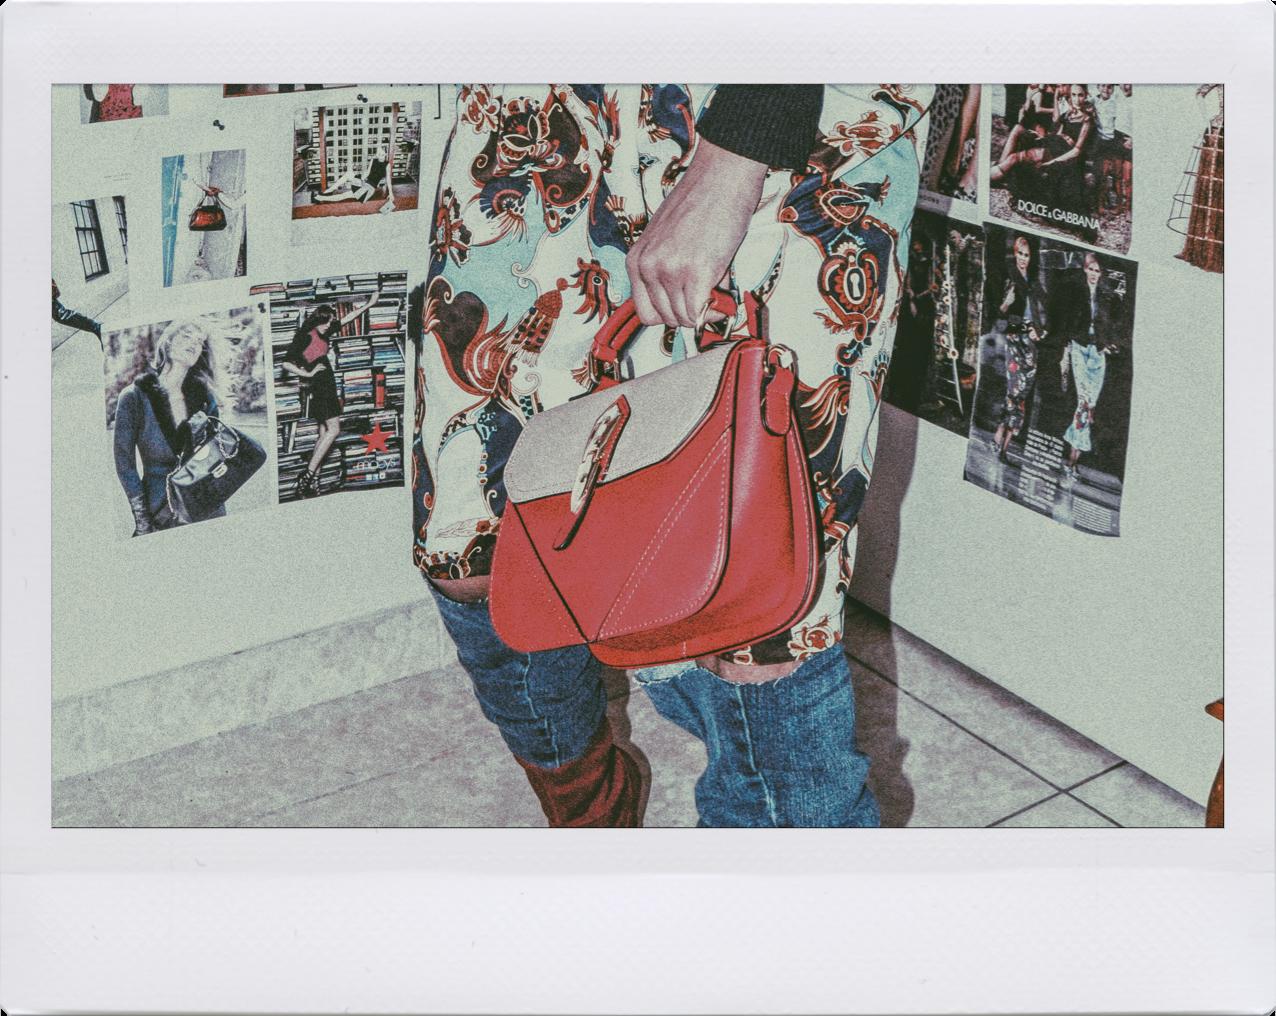 miami-fasion-editorial-photography-stylist-illy-perez